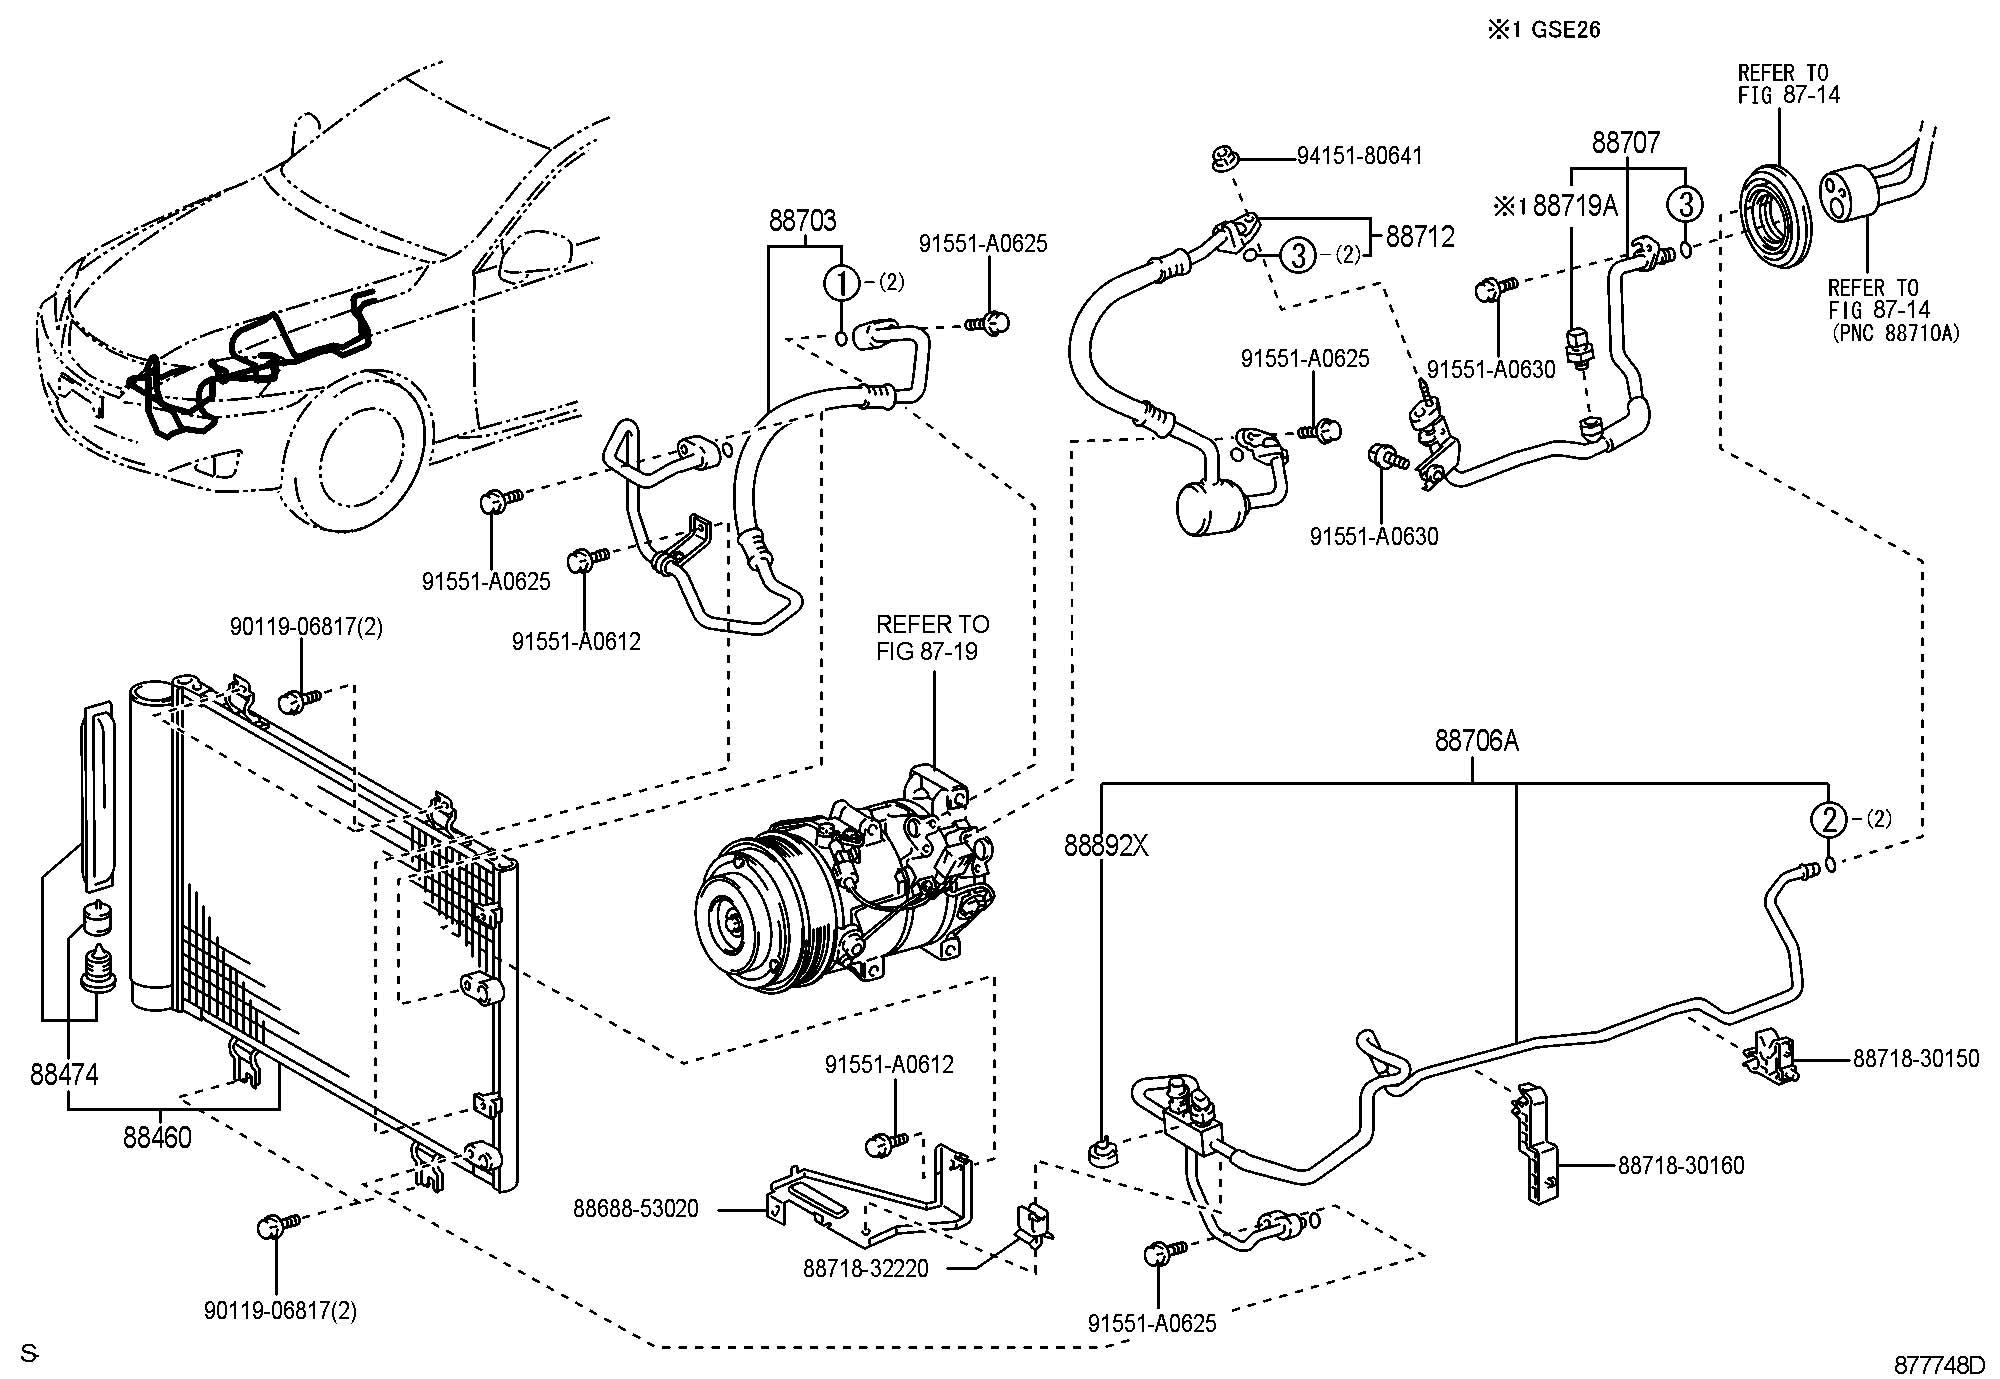 1995 toyota 4runner wiring diagram bf falcon stereo ac html imageresizertool com